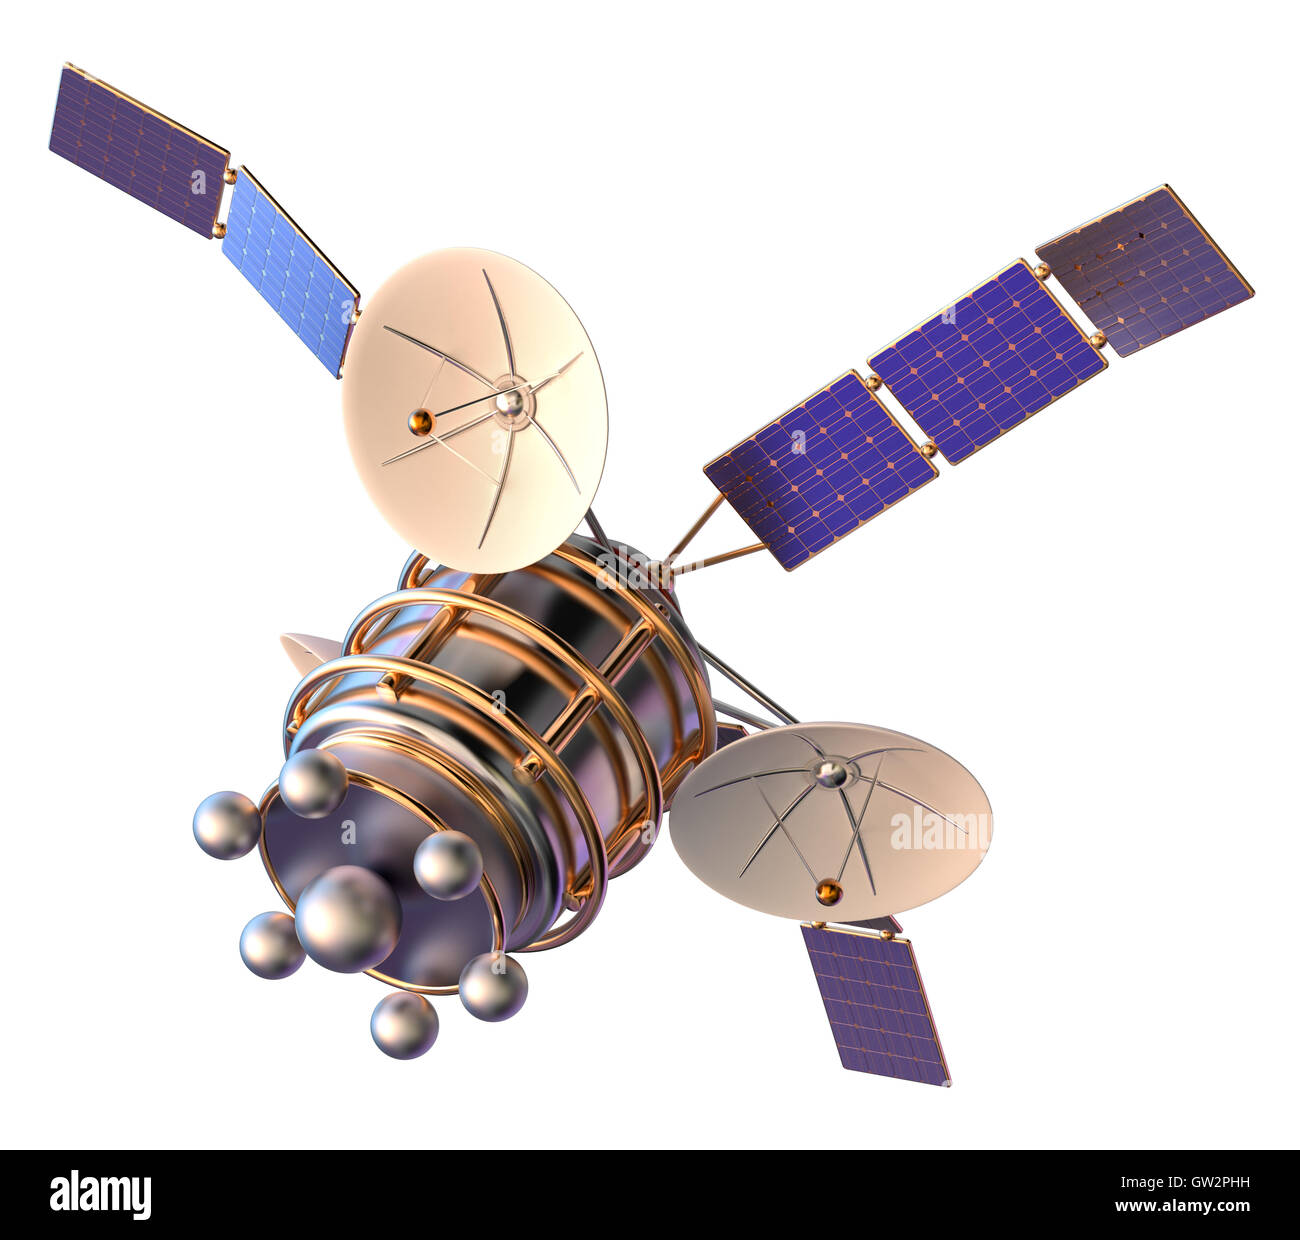 gps planet navigation instructions